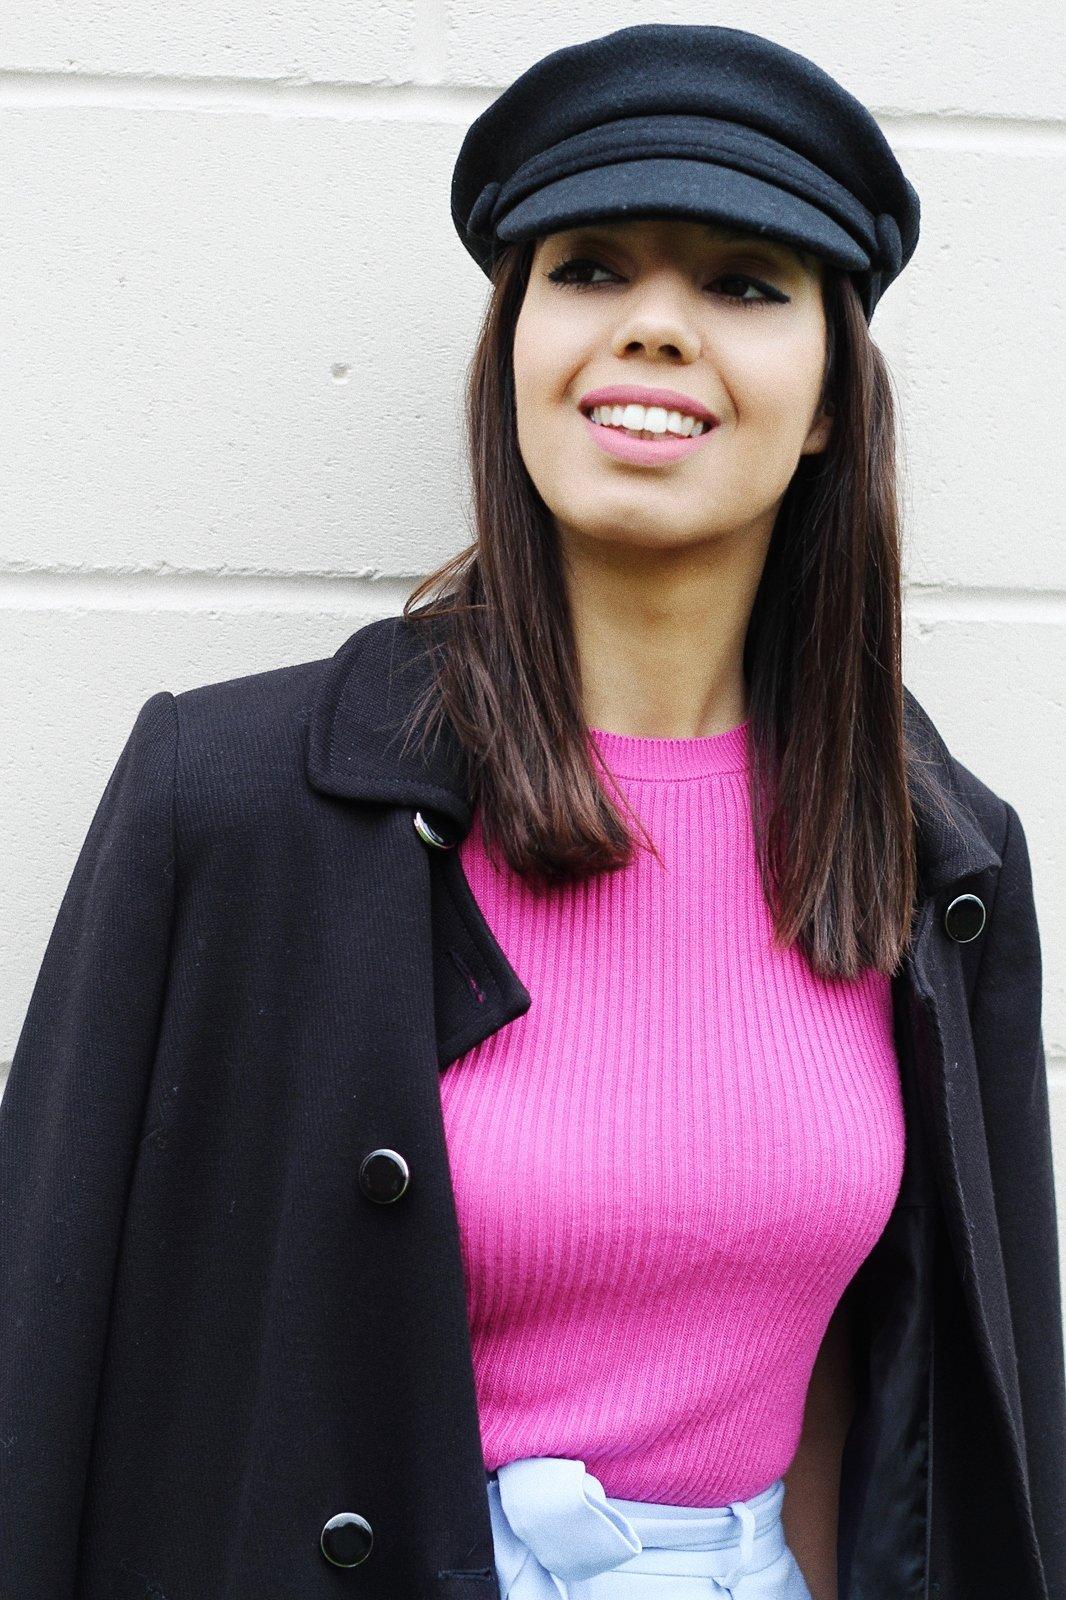 Mixed race girl - Instagram Blackfishing - The Style of Laura Jane